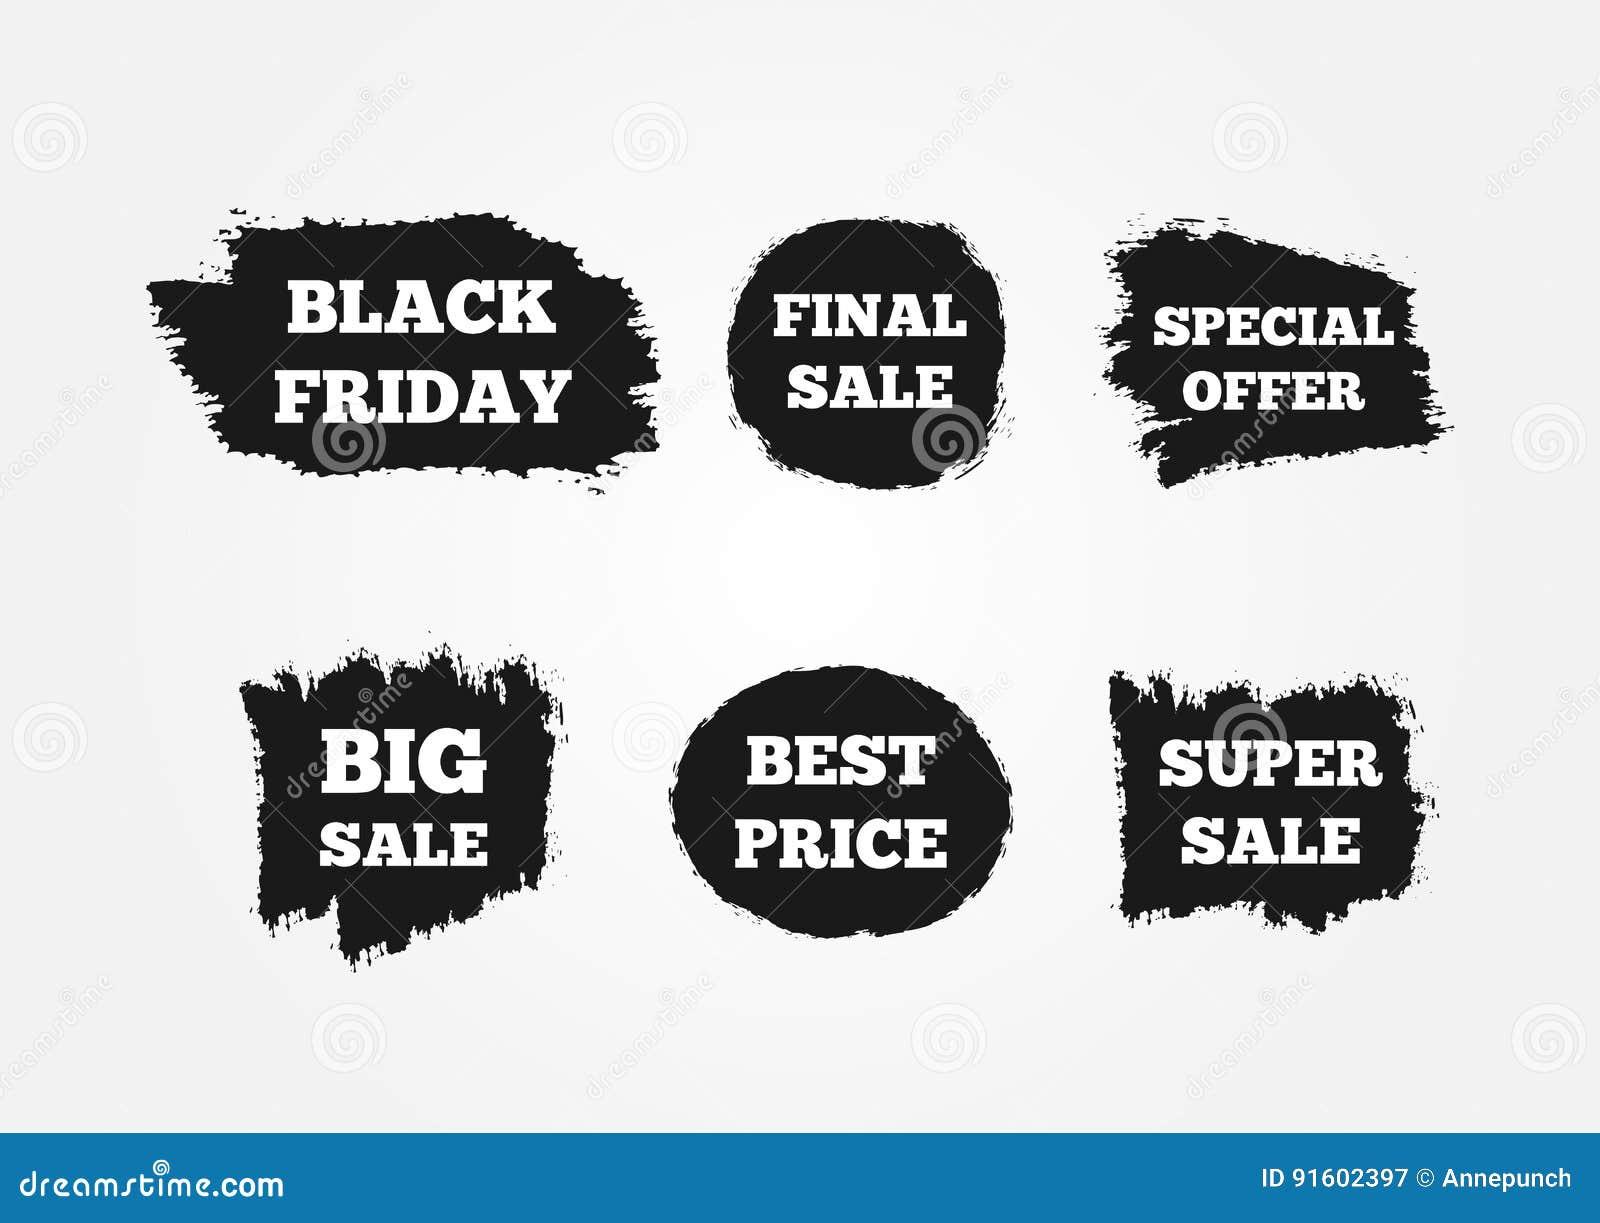 Etiquetas engomadas para atraer a clientes venta final for Piscina estructural grande oferta precio